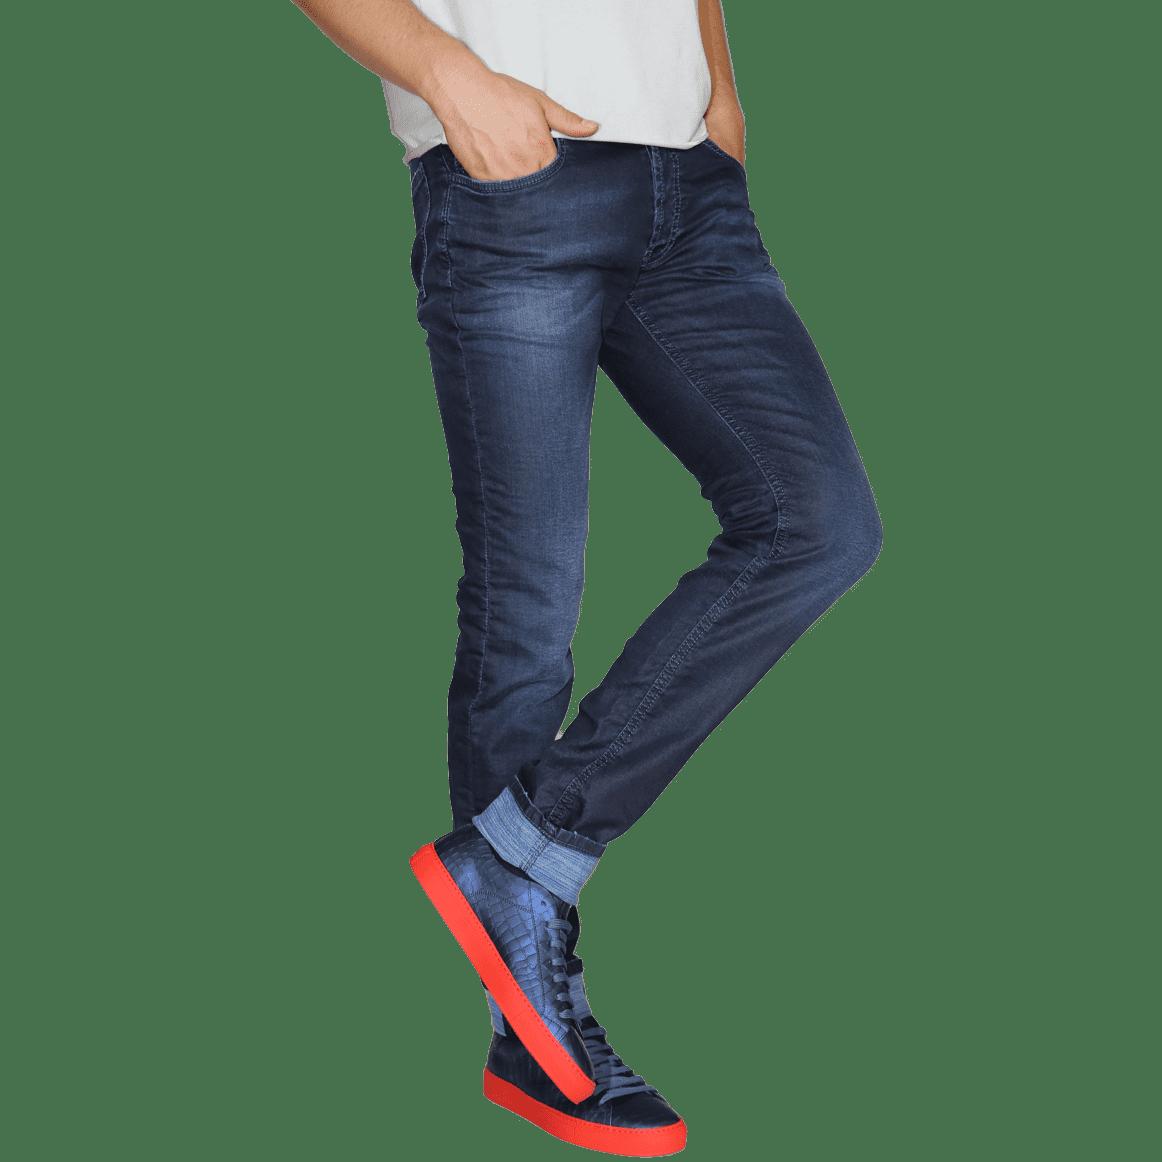 Cabinero Stiles Berlin PG Enjoy Jeans, Herrenhosen, made in Italy AW17-18 denim Blue-Blue 17